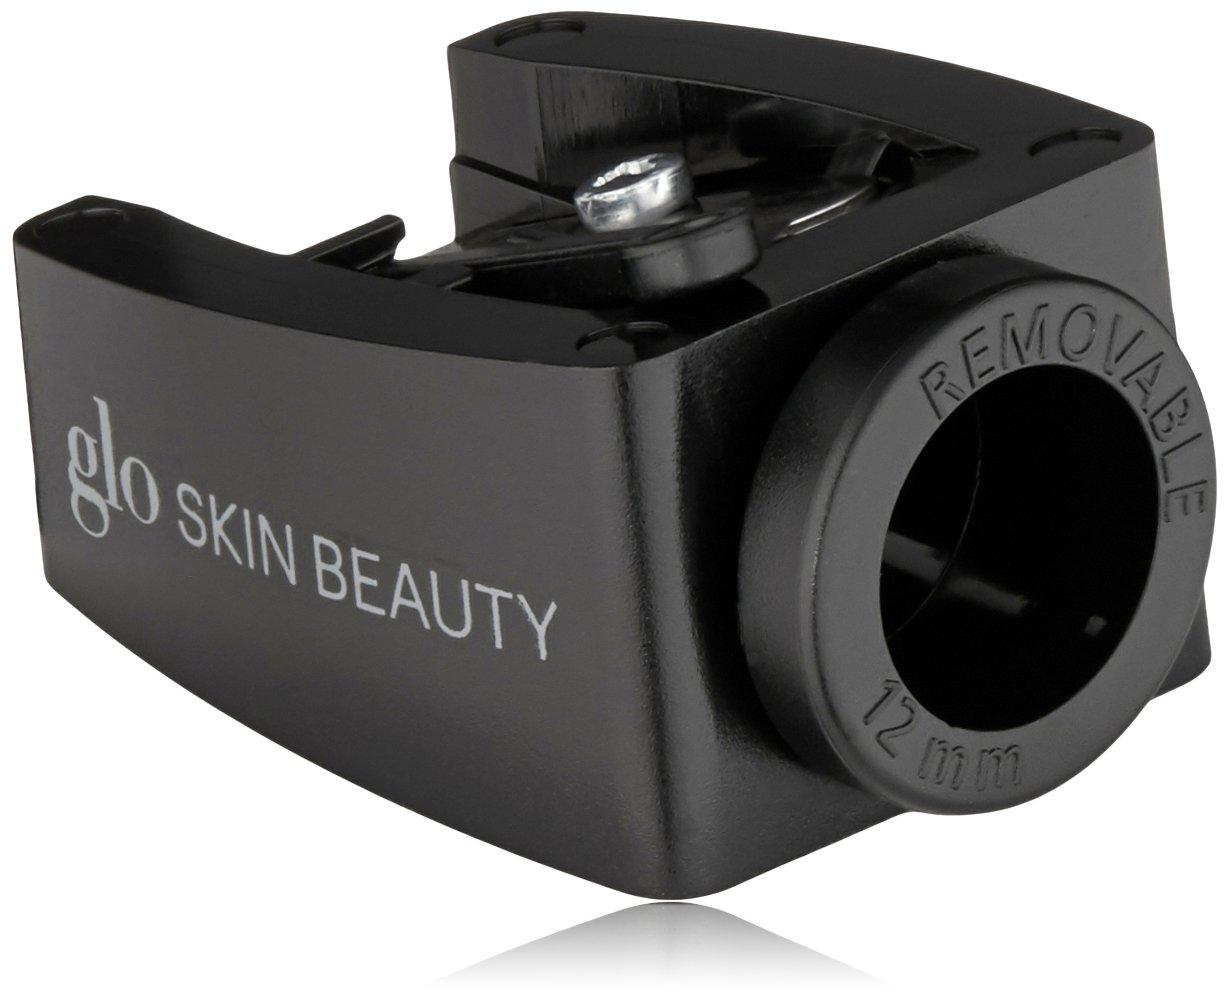 Glo Skin Beauty Crayon Sharpener - Black